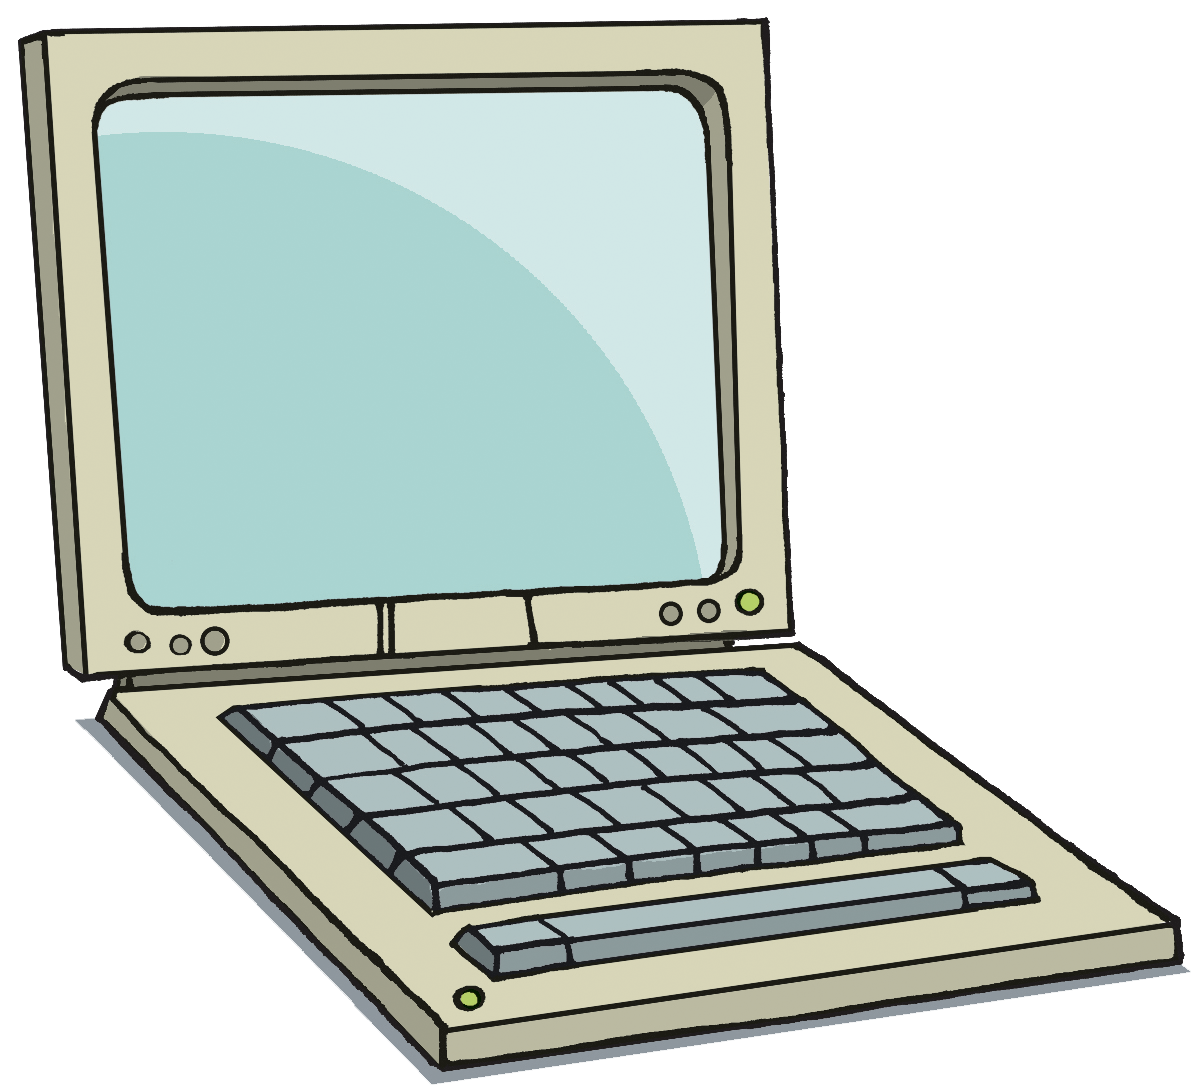 Mac laptop clipart.